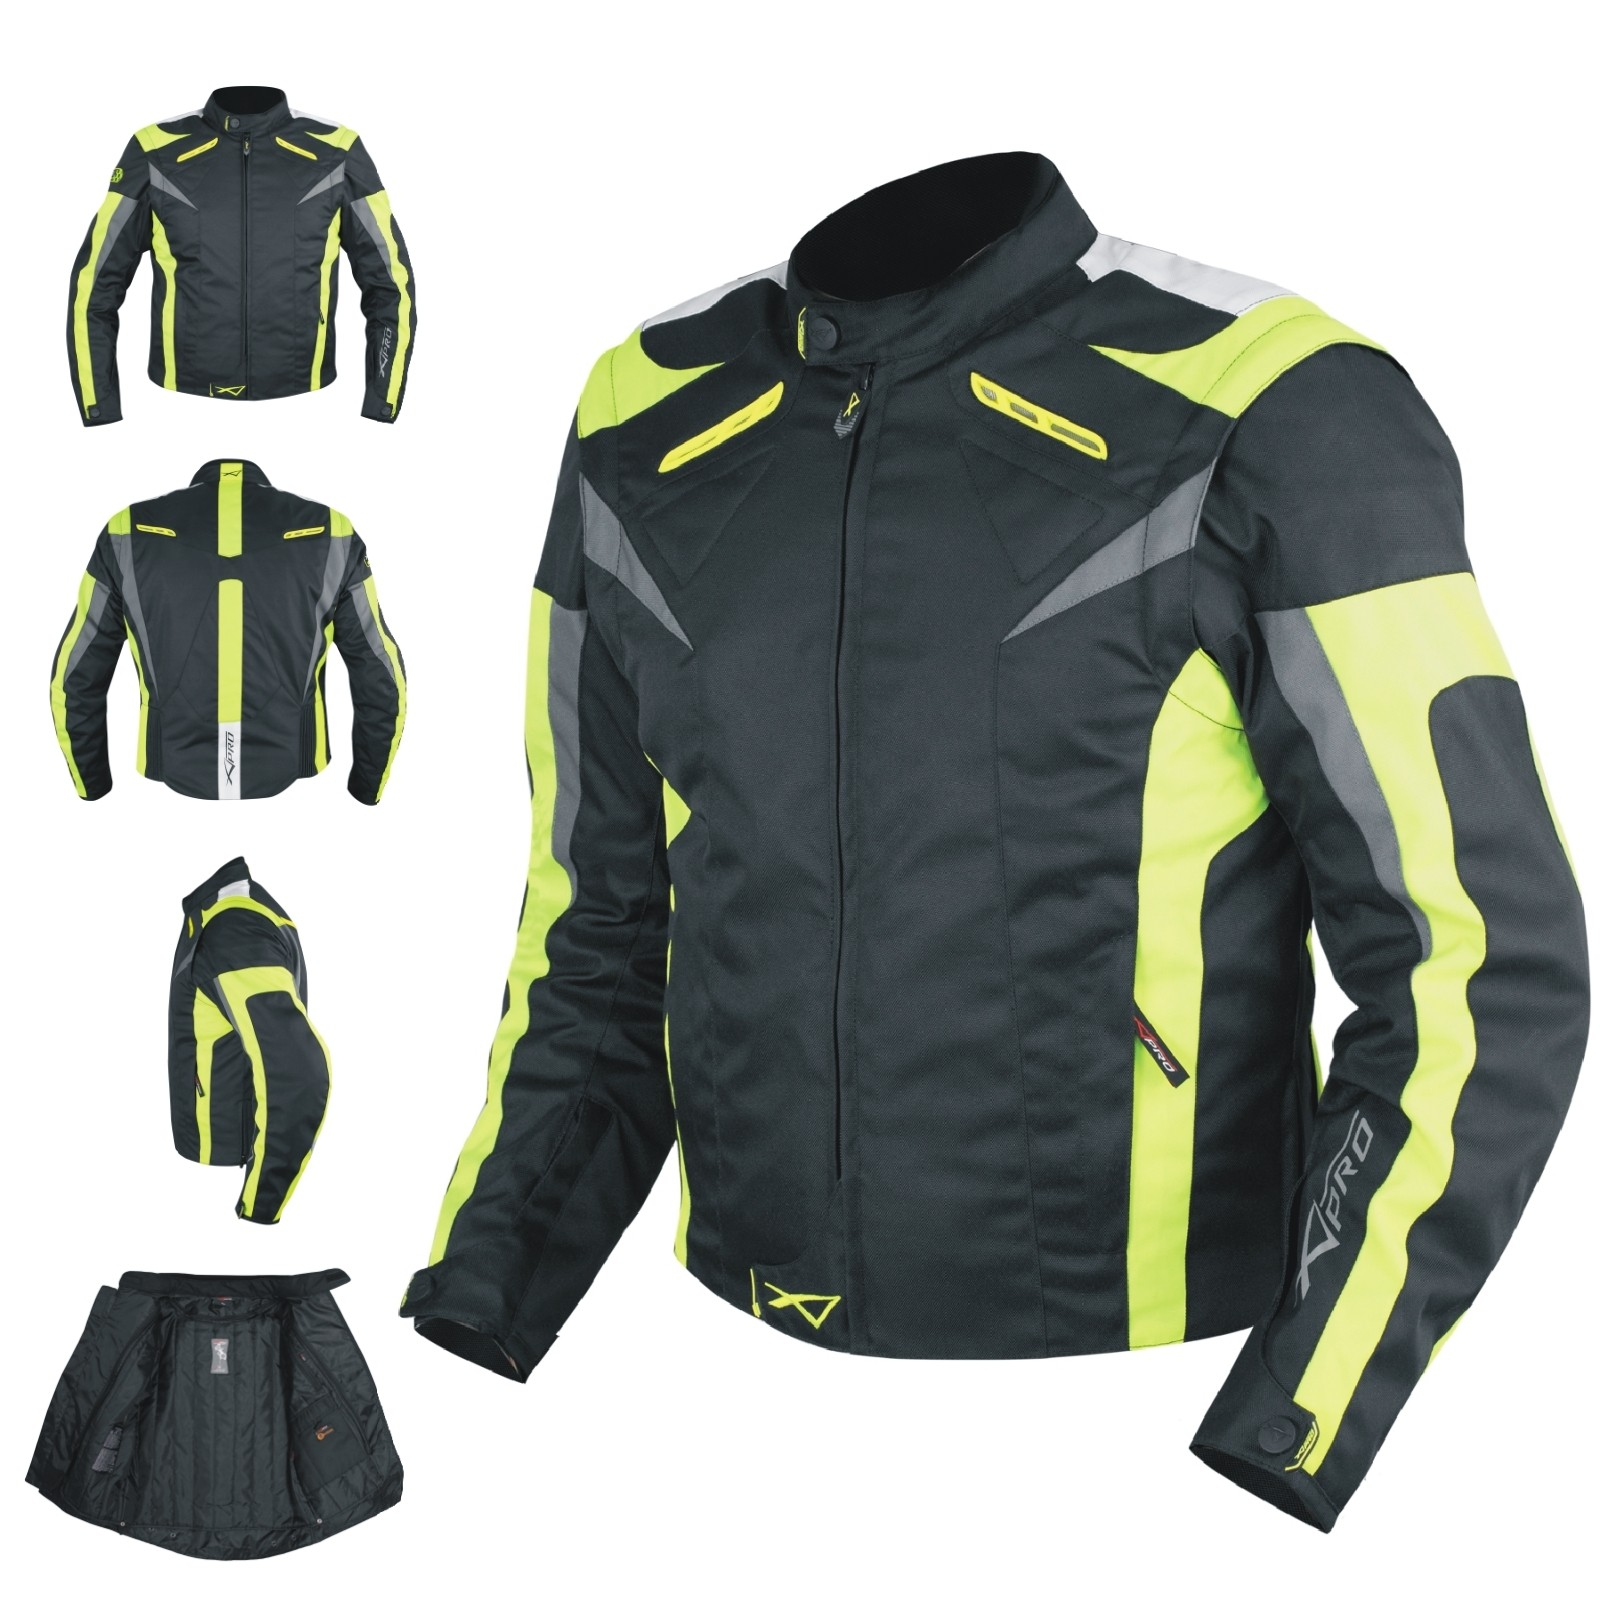 Ace-A-Pro-Giacca-Jacket-Fluo-Yellow-Giallo-Moto-Motorcycle-Sonic-Moto_ok